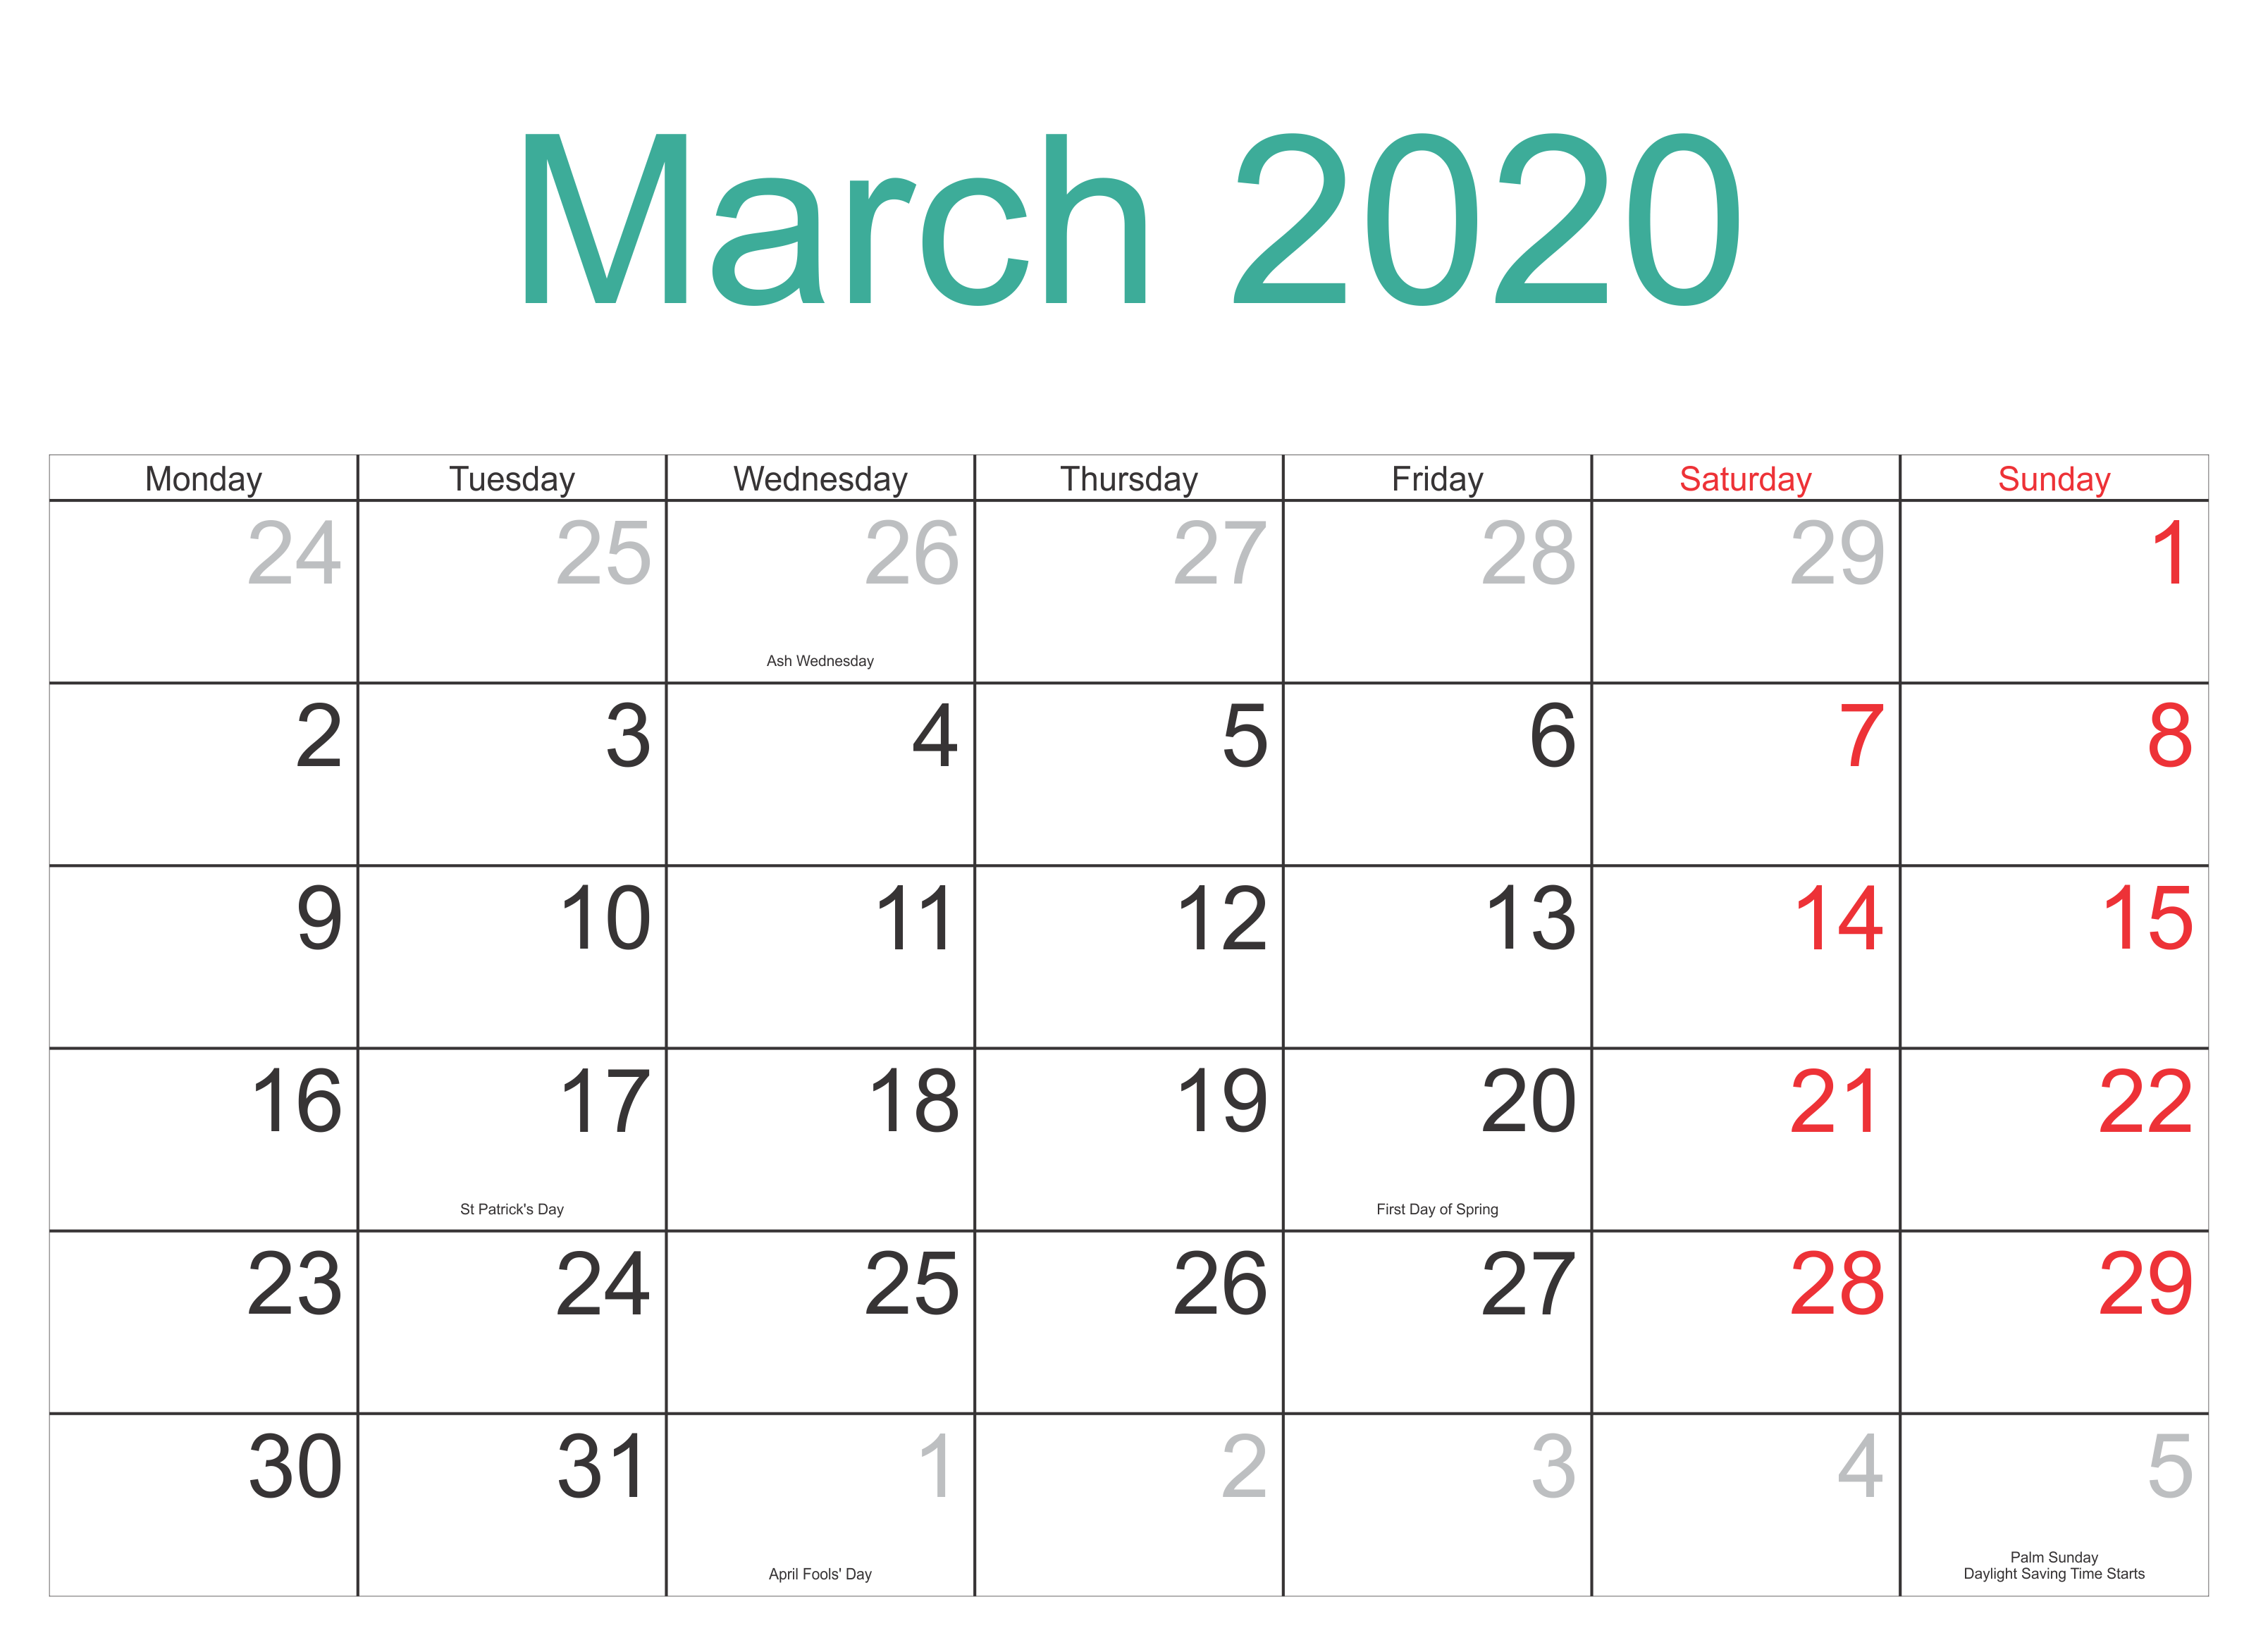 March 2020 Calendar With Holidays UK Canada USA